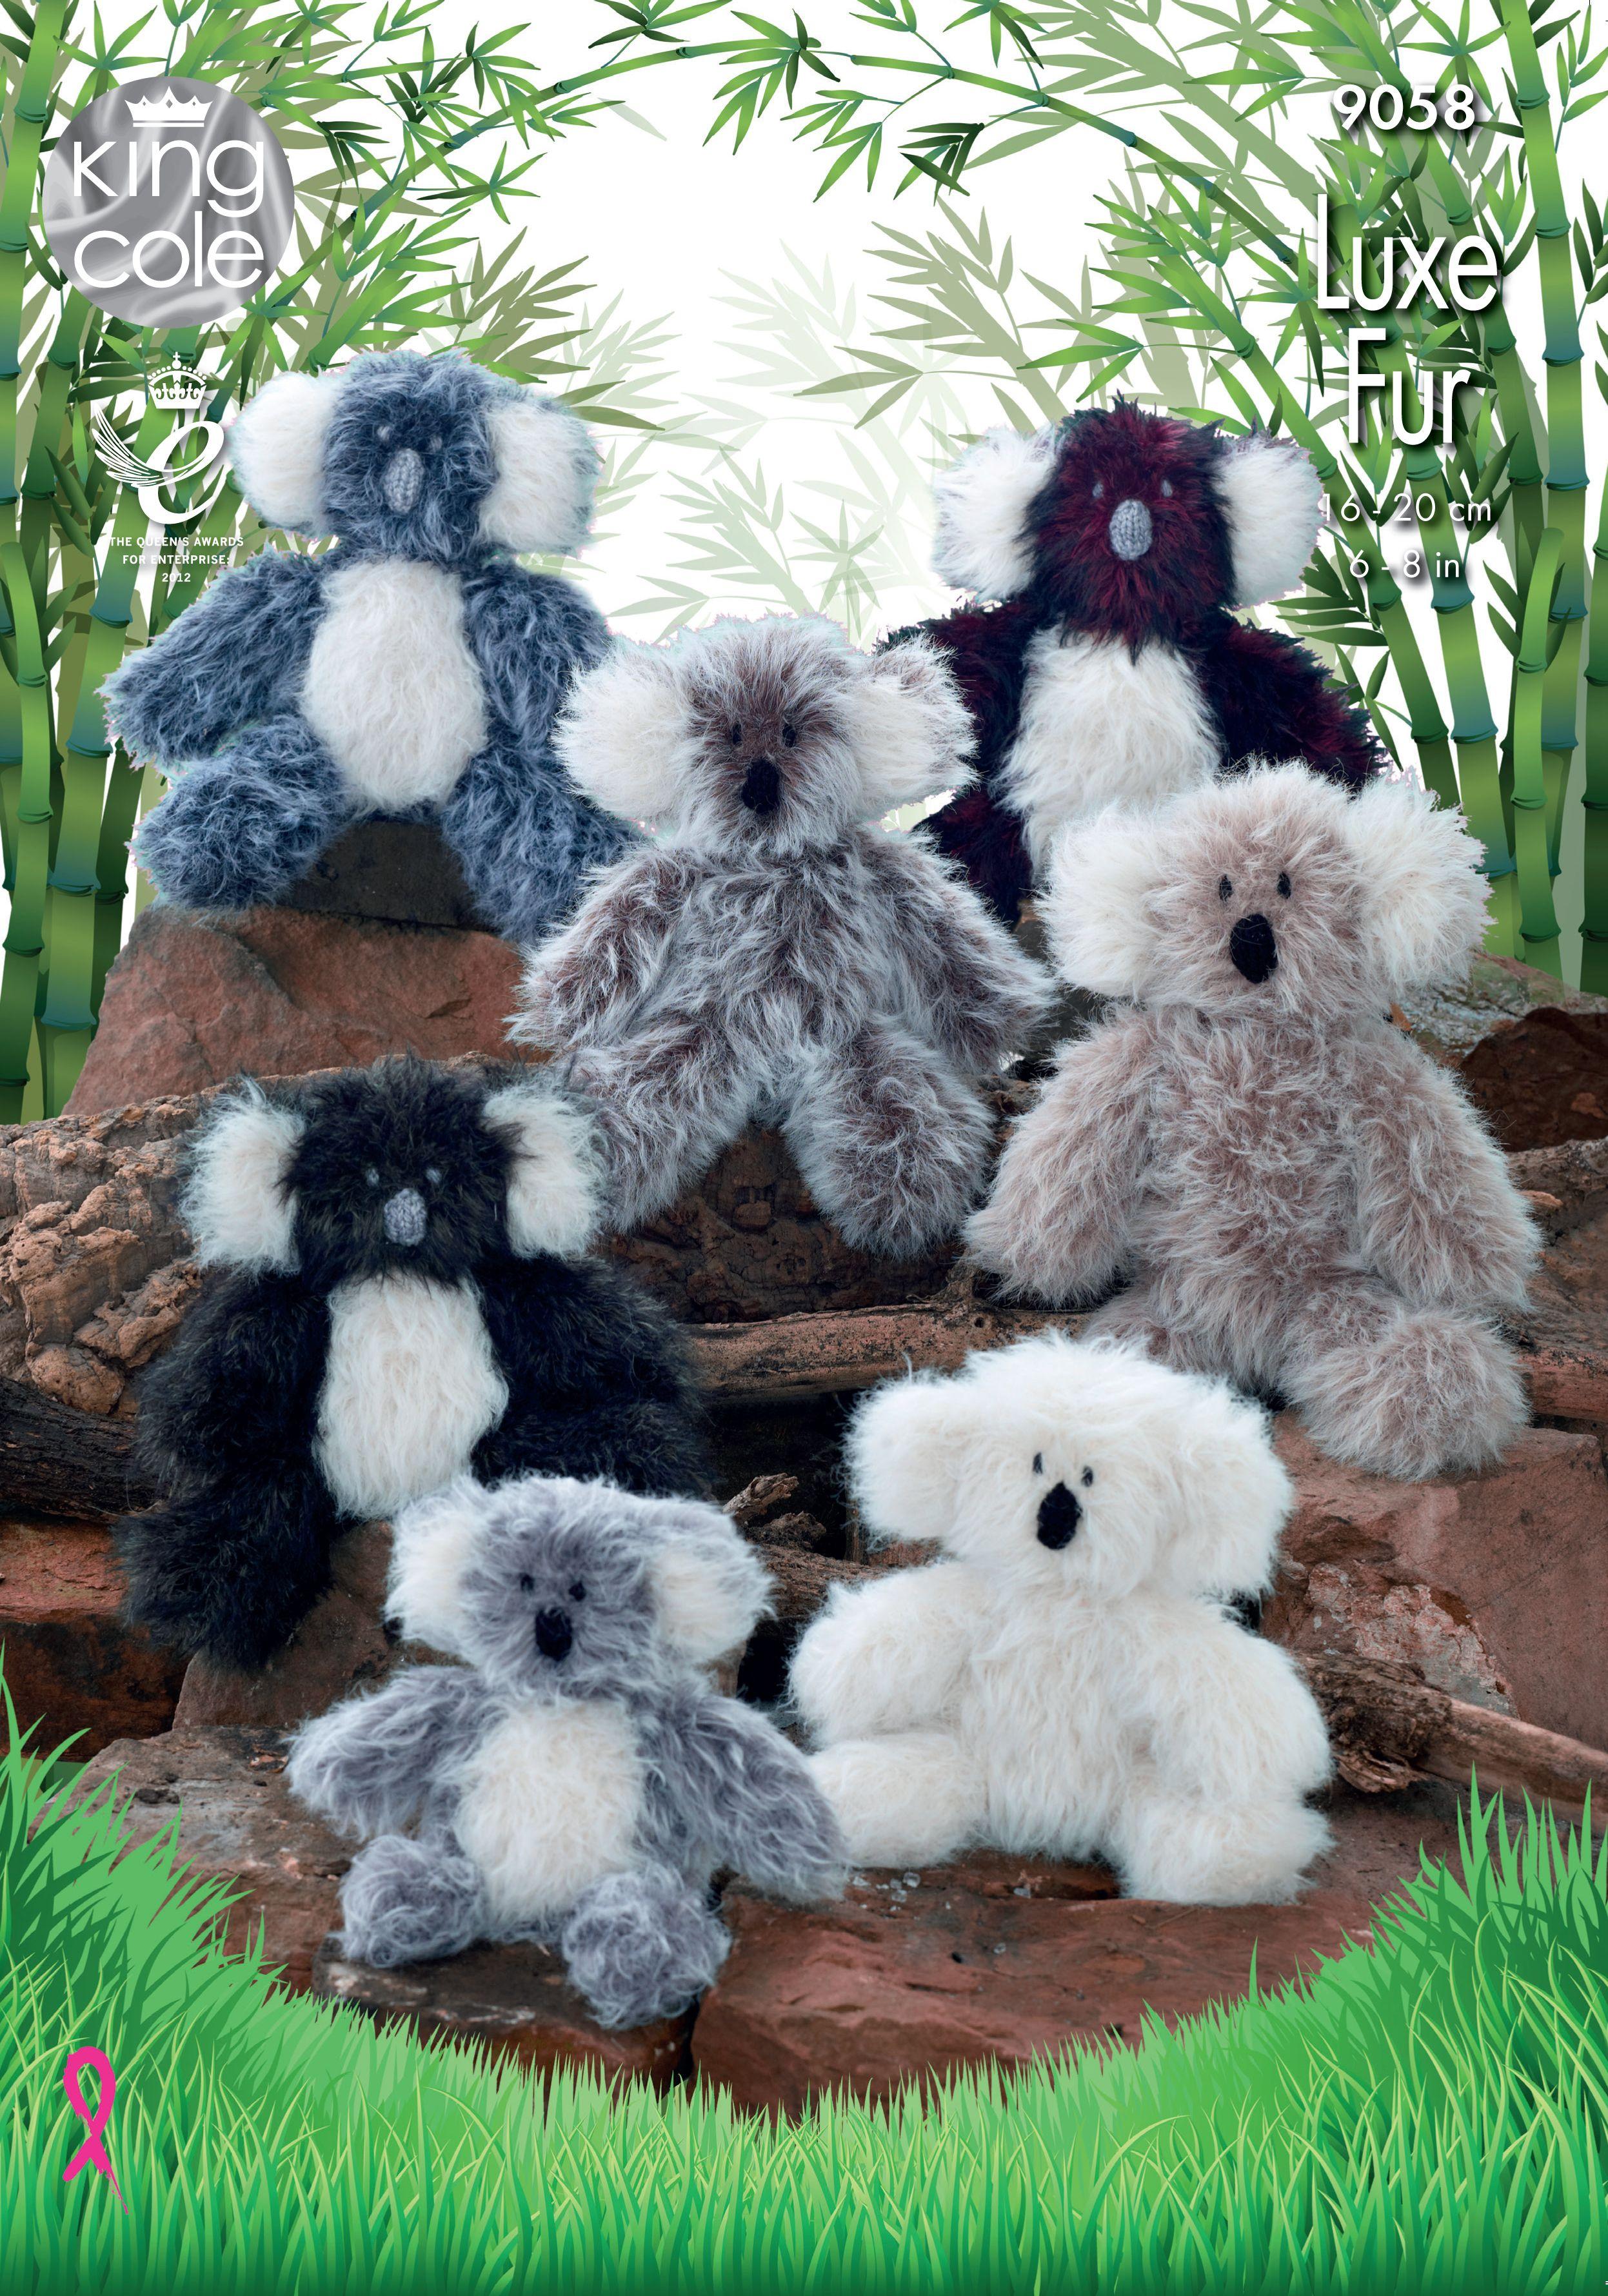 Koala knitted with Luxe Fur - King Cole #Koala #Australia   Toys and ...